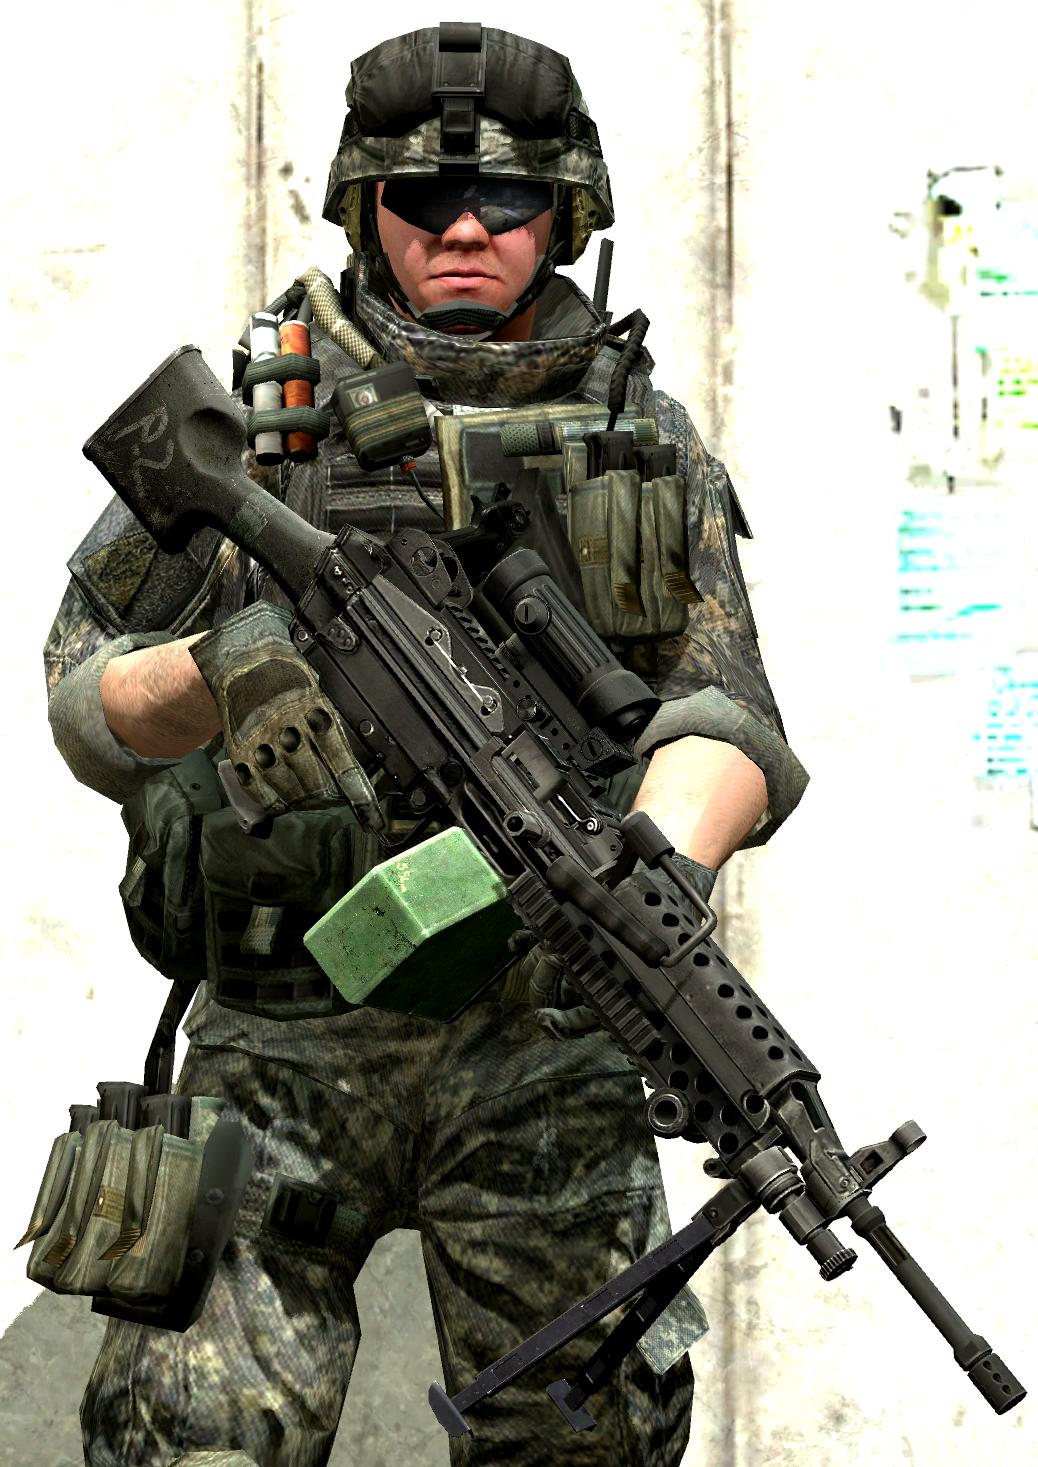 Army Ranger Wallpaper 1038x1467